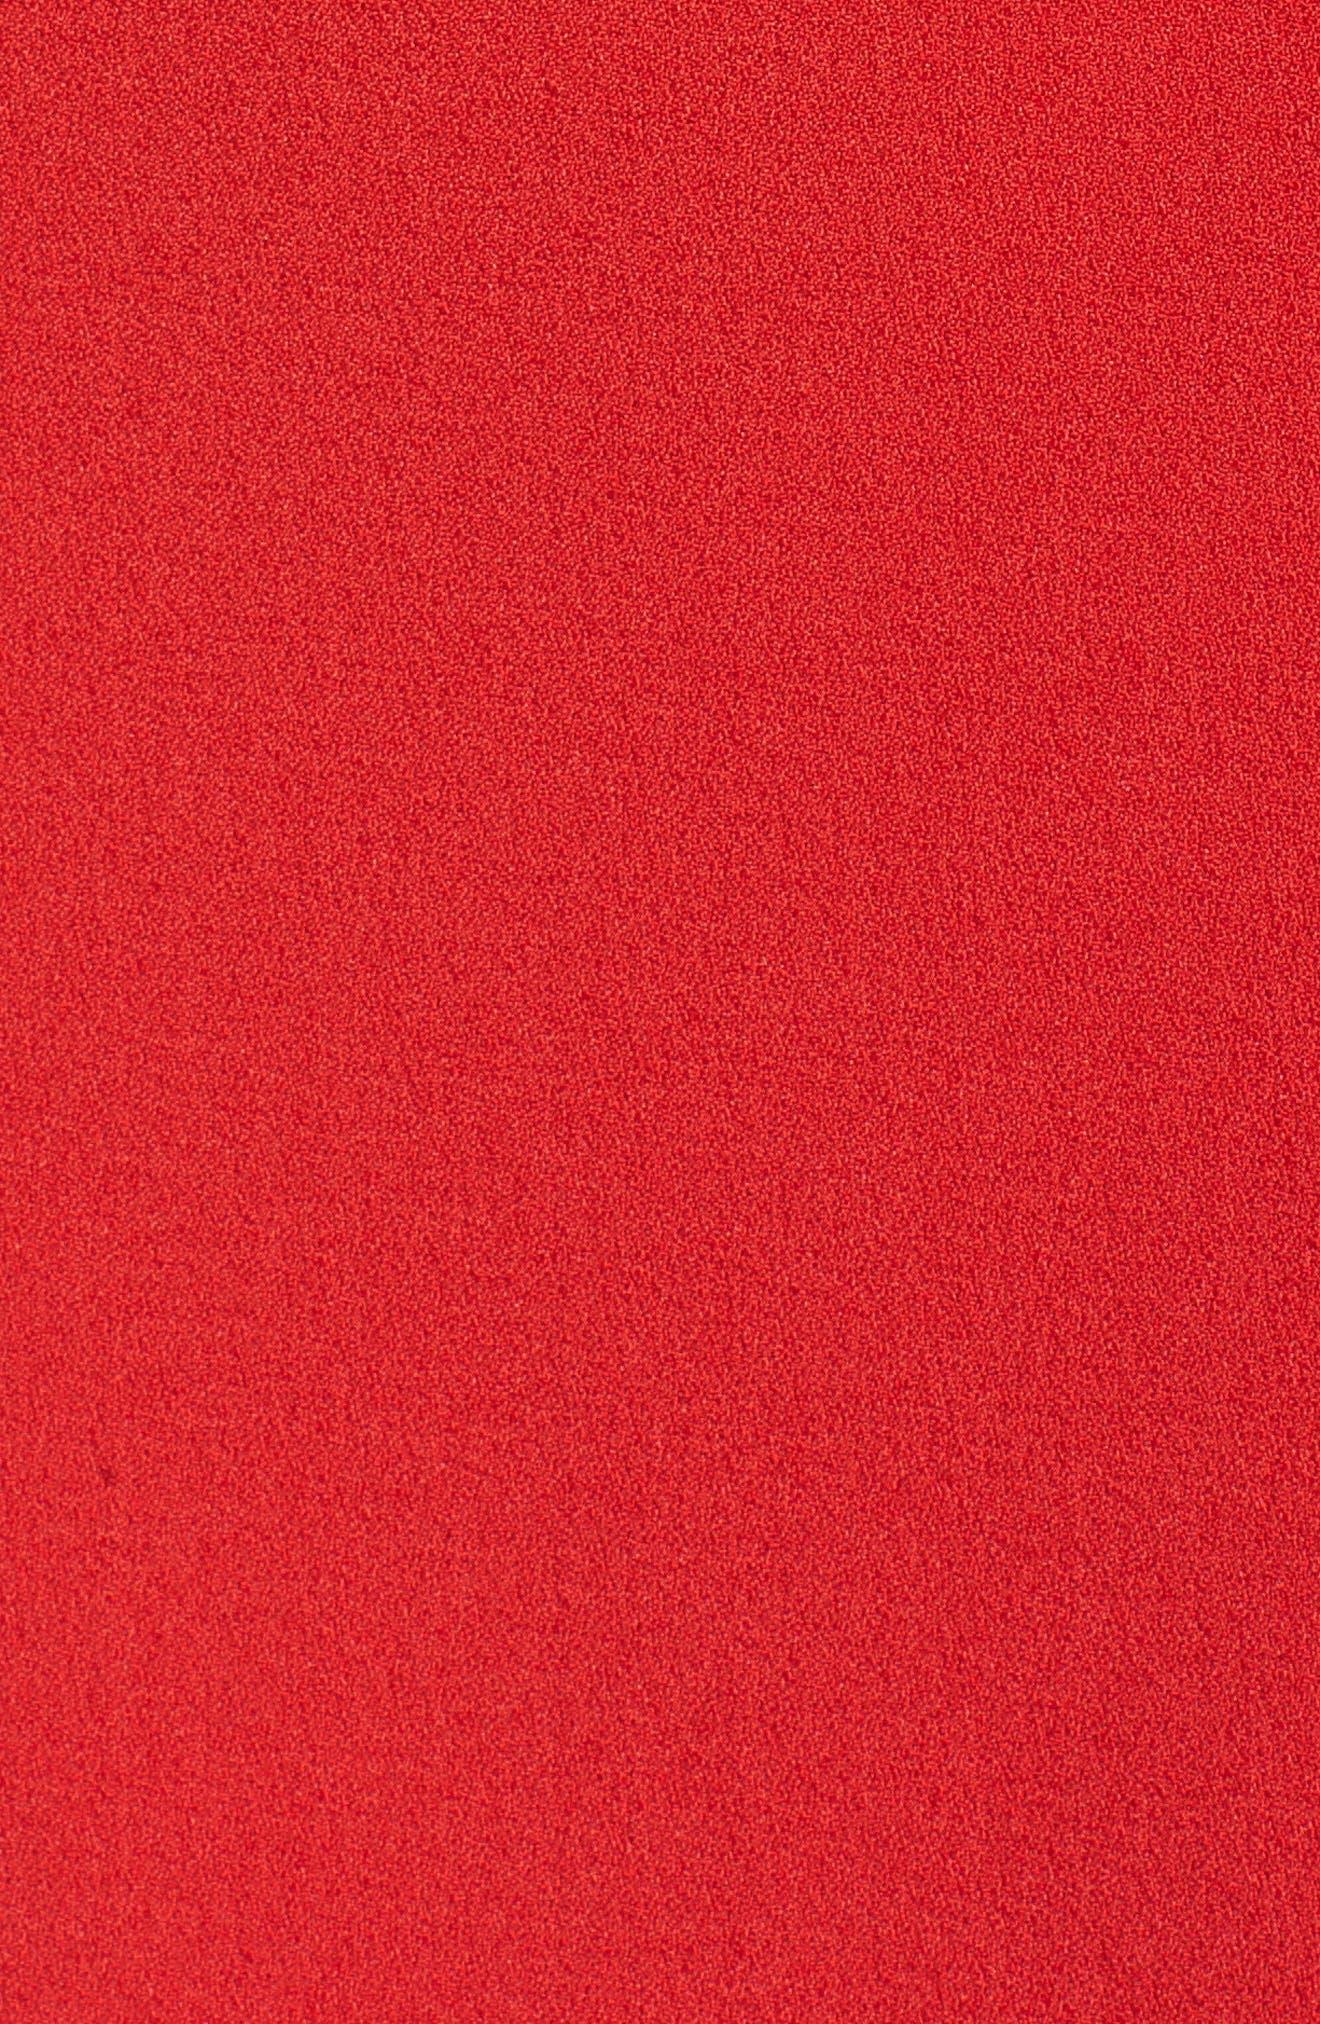 One-Shoulder Twist Front Sheath Dress,                             Alternate thumbnail 6, color,                             RED